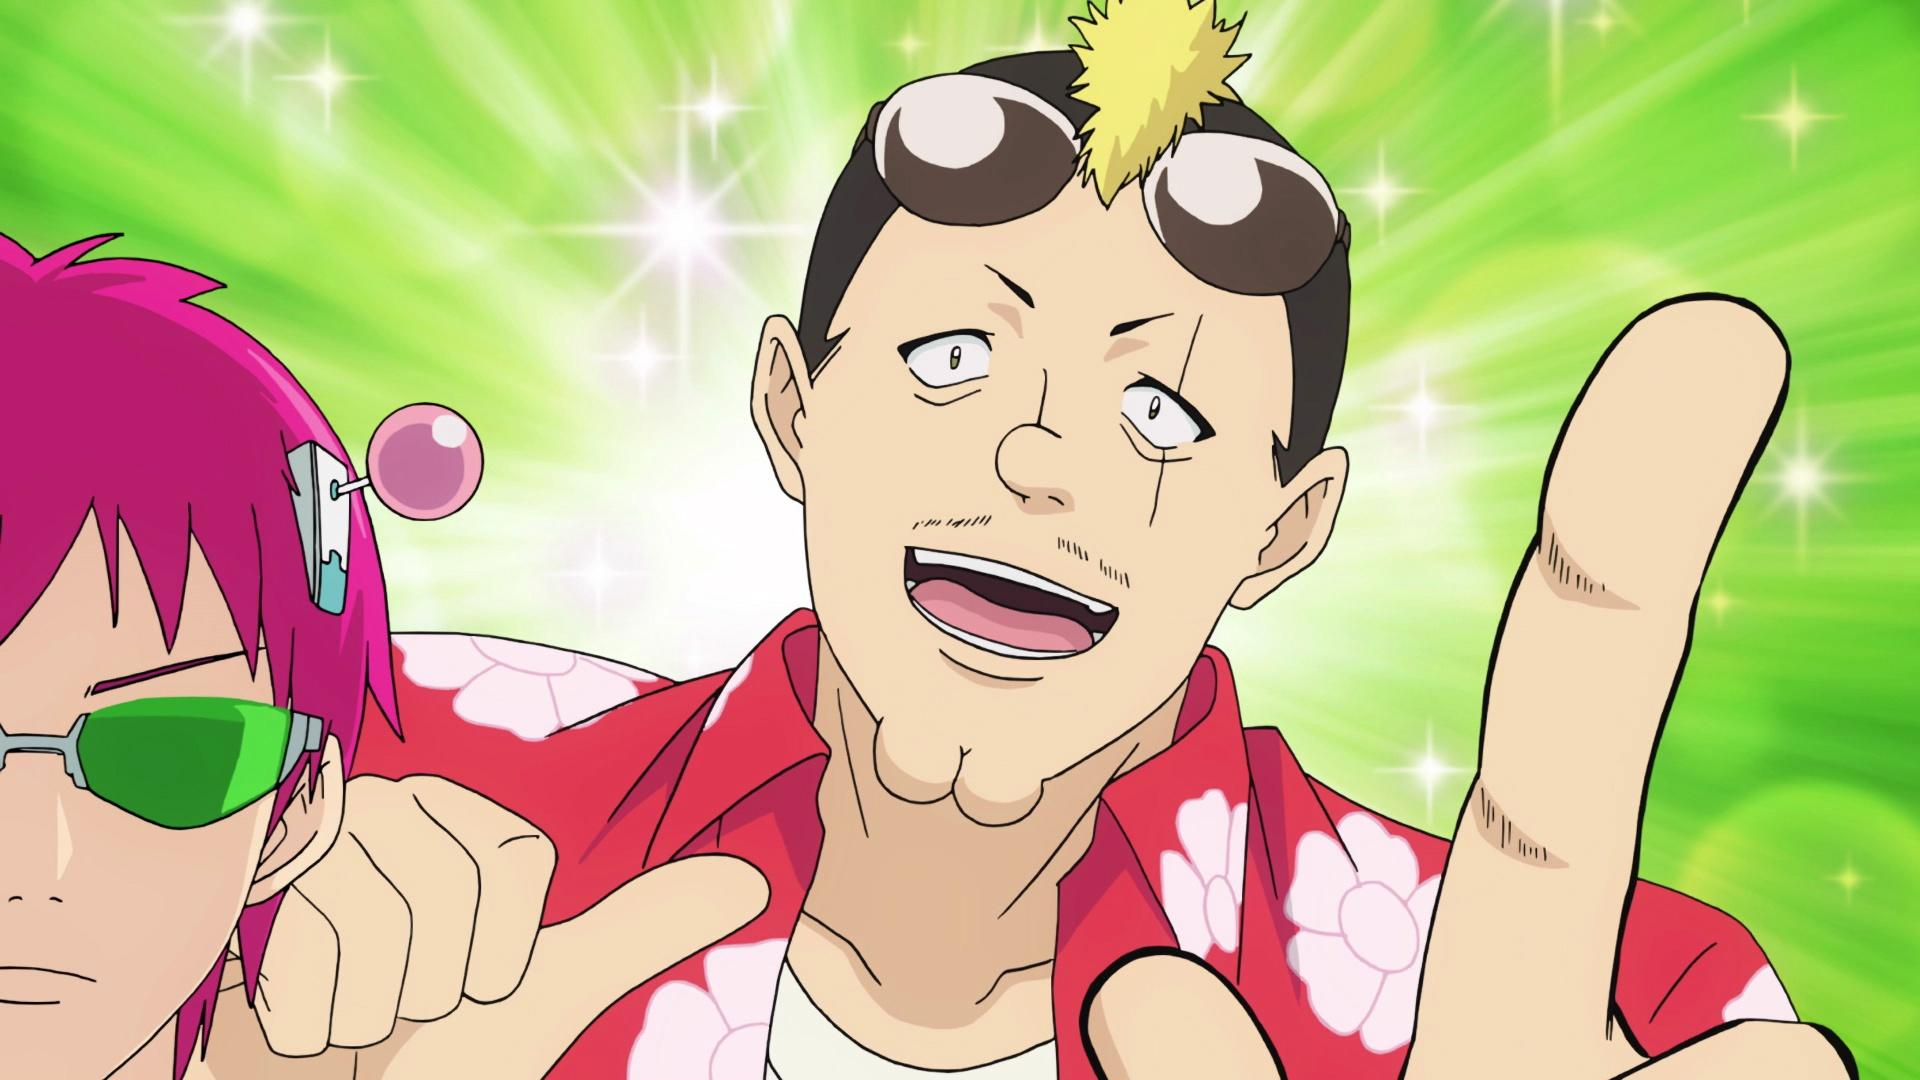 Watch the disastrous life of saiki k season 1 episode 3 sub dub anime simulcast funimation - The disastrous life of saiki k season 2 episode 1 ...